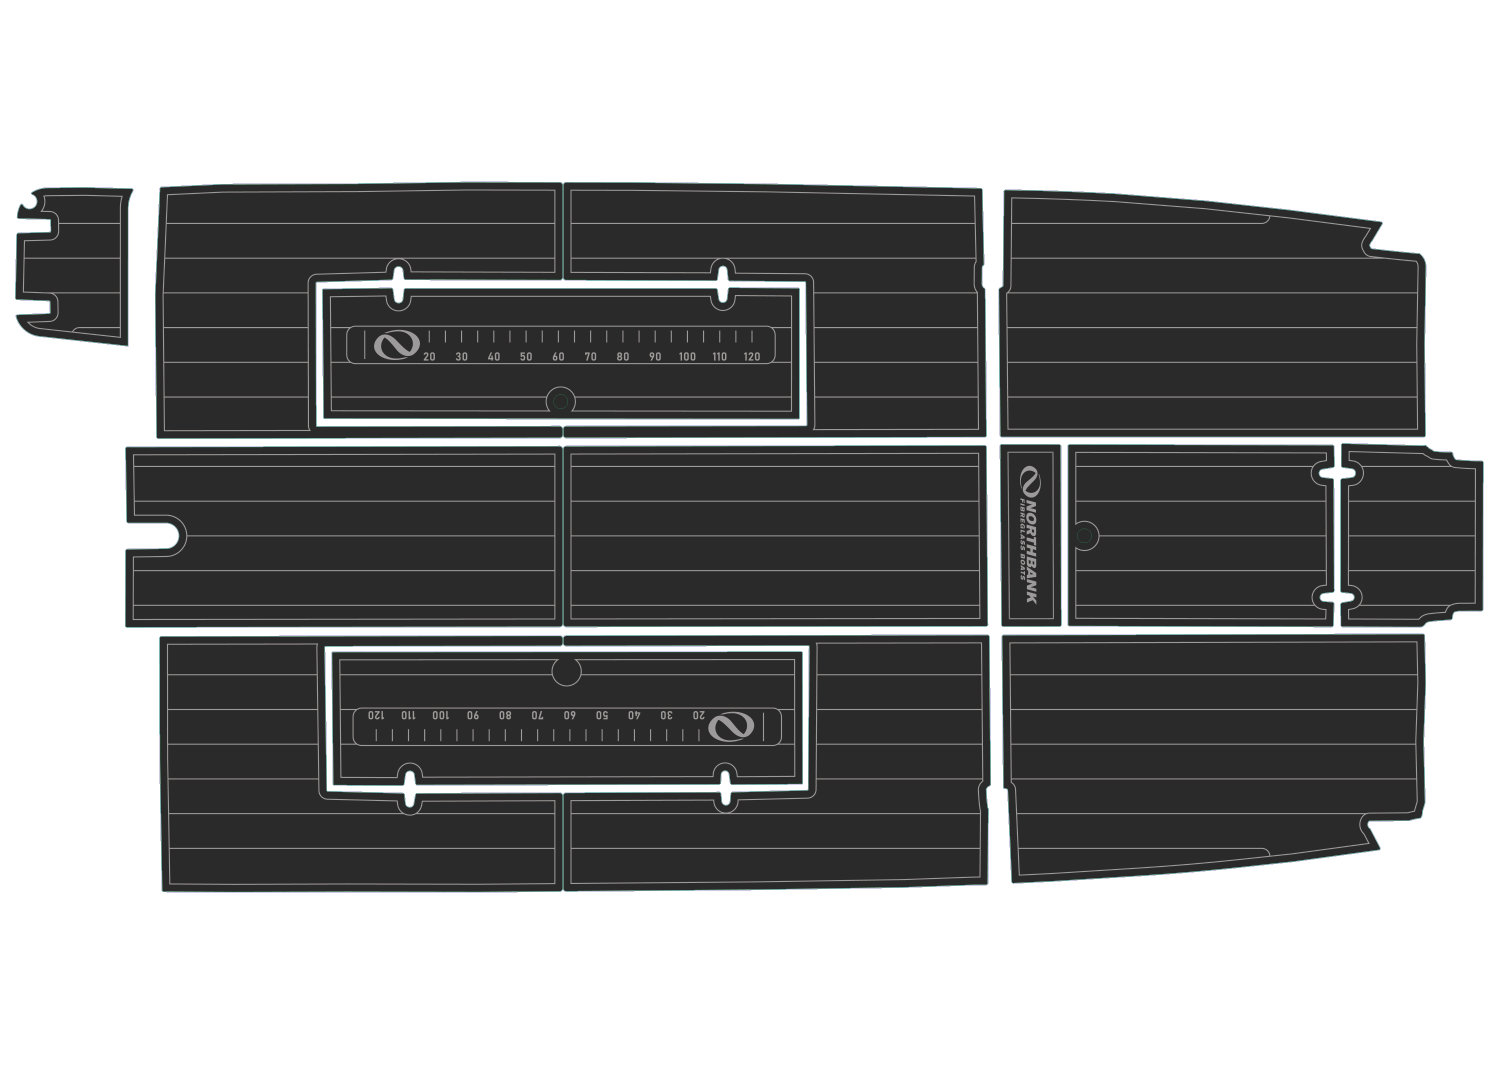 Northbank HT udek boat flooring